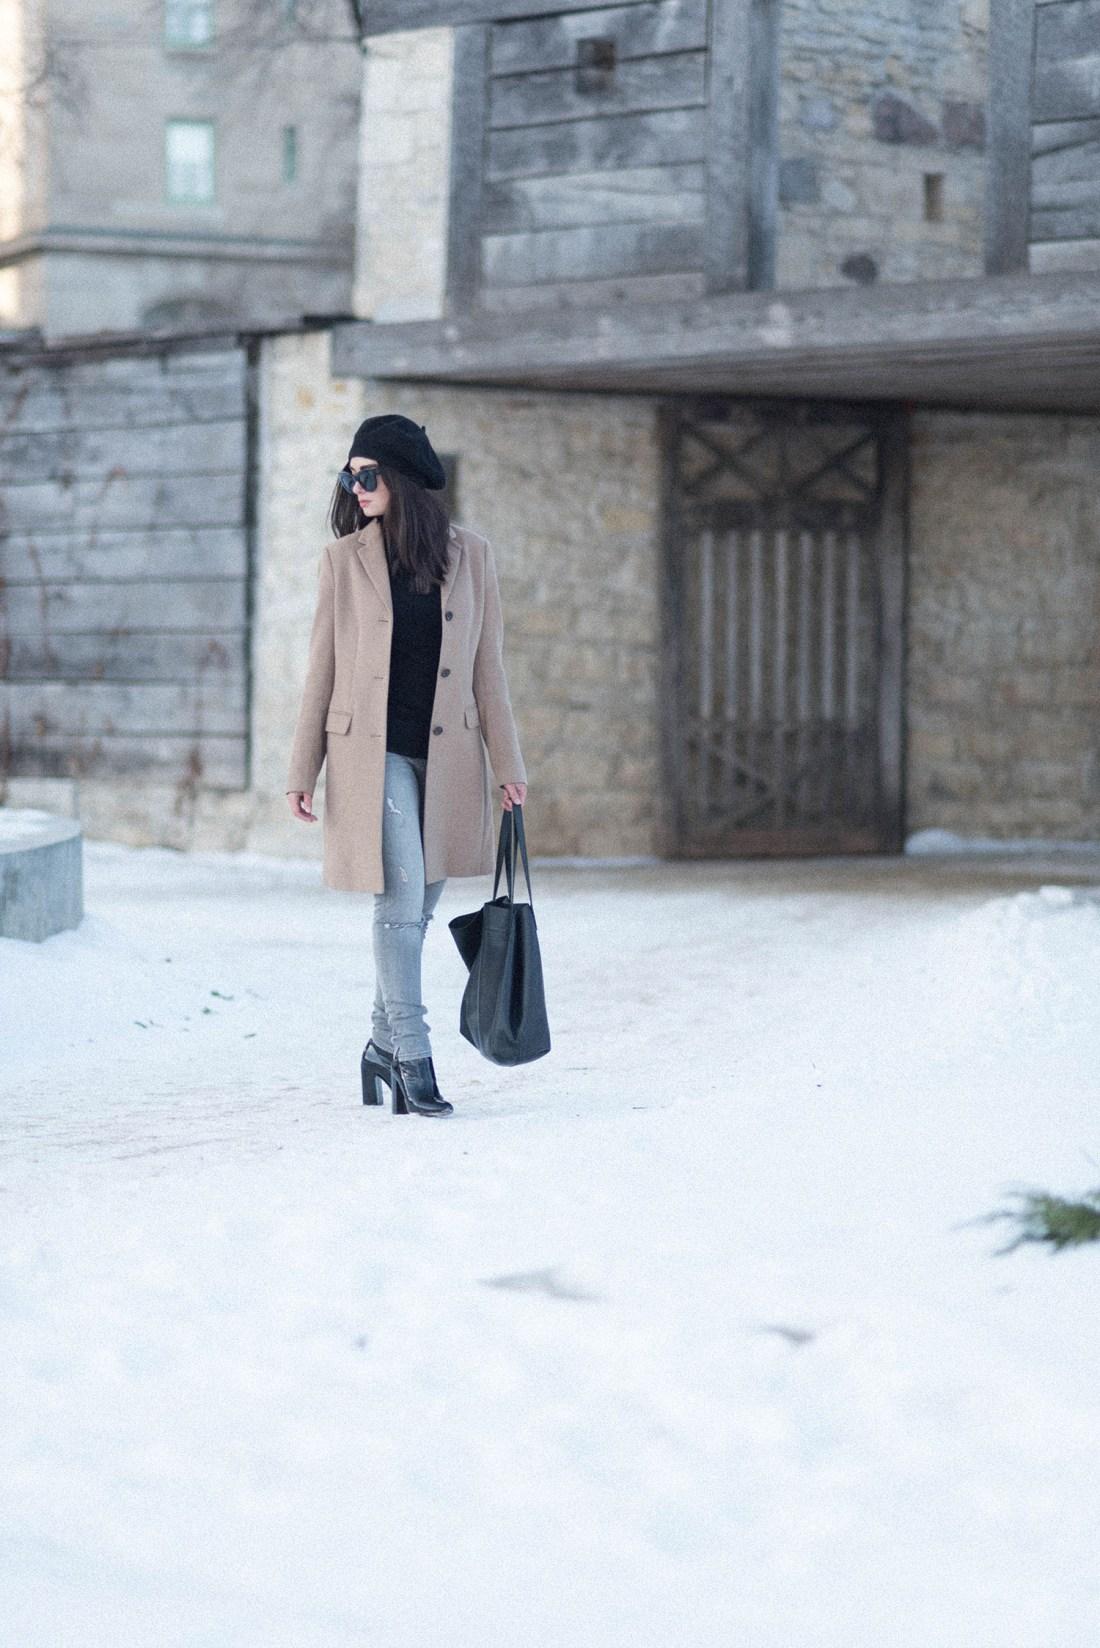 Winnipeg fashion blogger Cee Fardoe of Coco & Vera walks outside Fort Garry wearing a Uniqlo camel coat and an Anthropologie beret